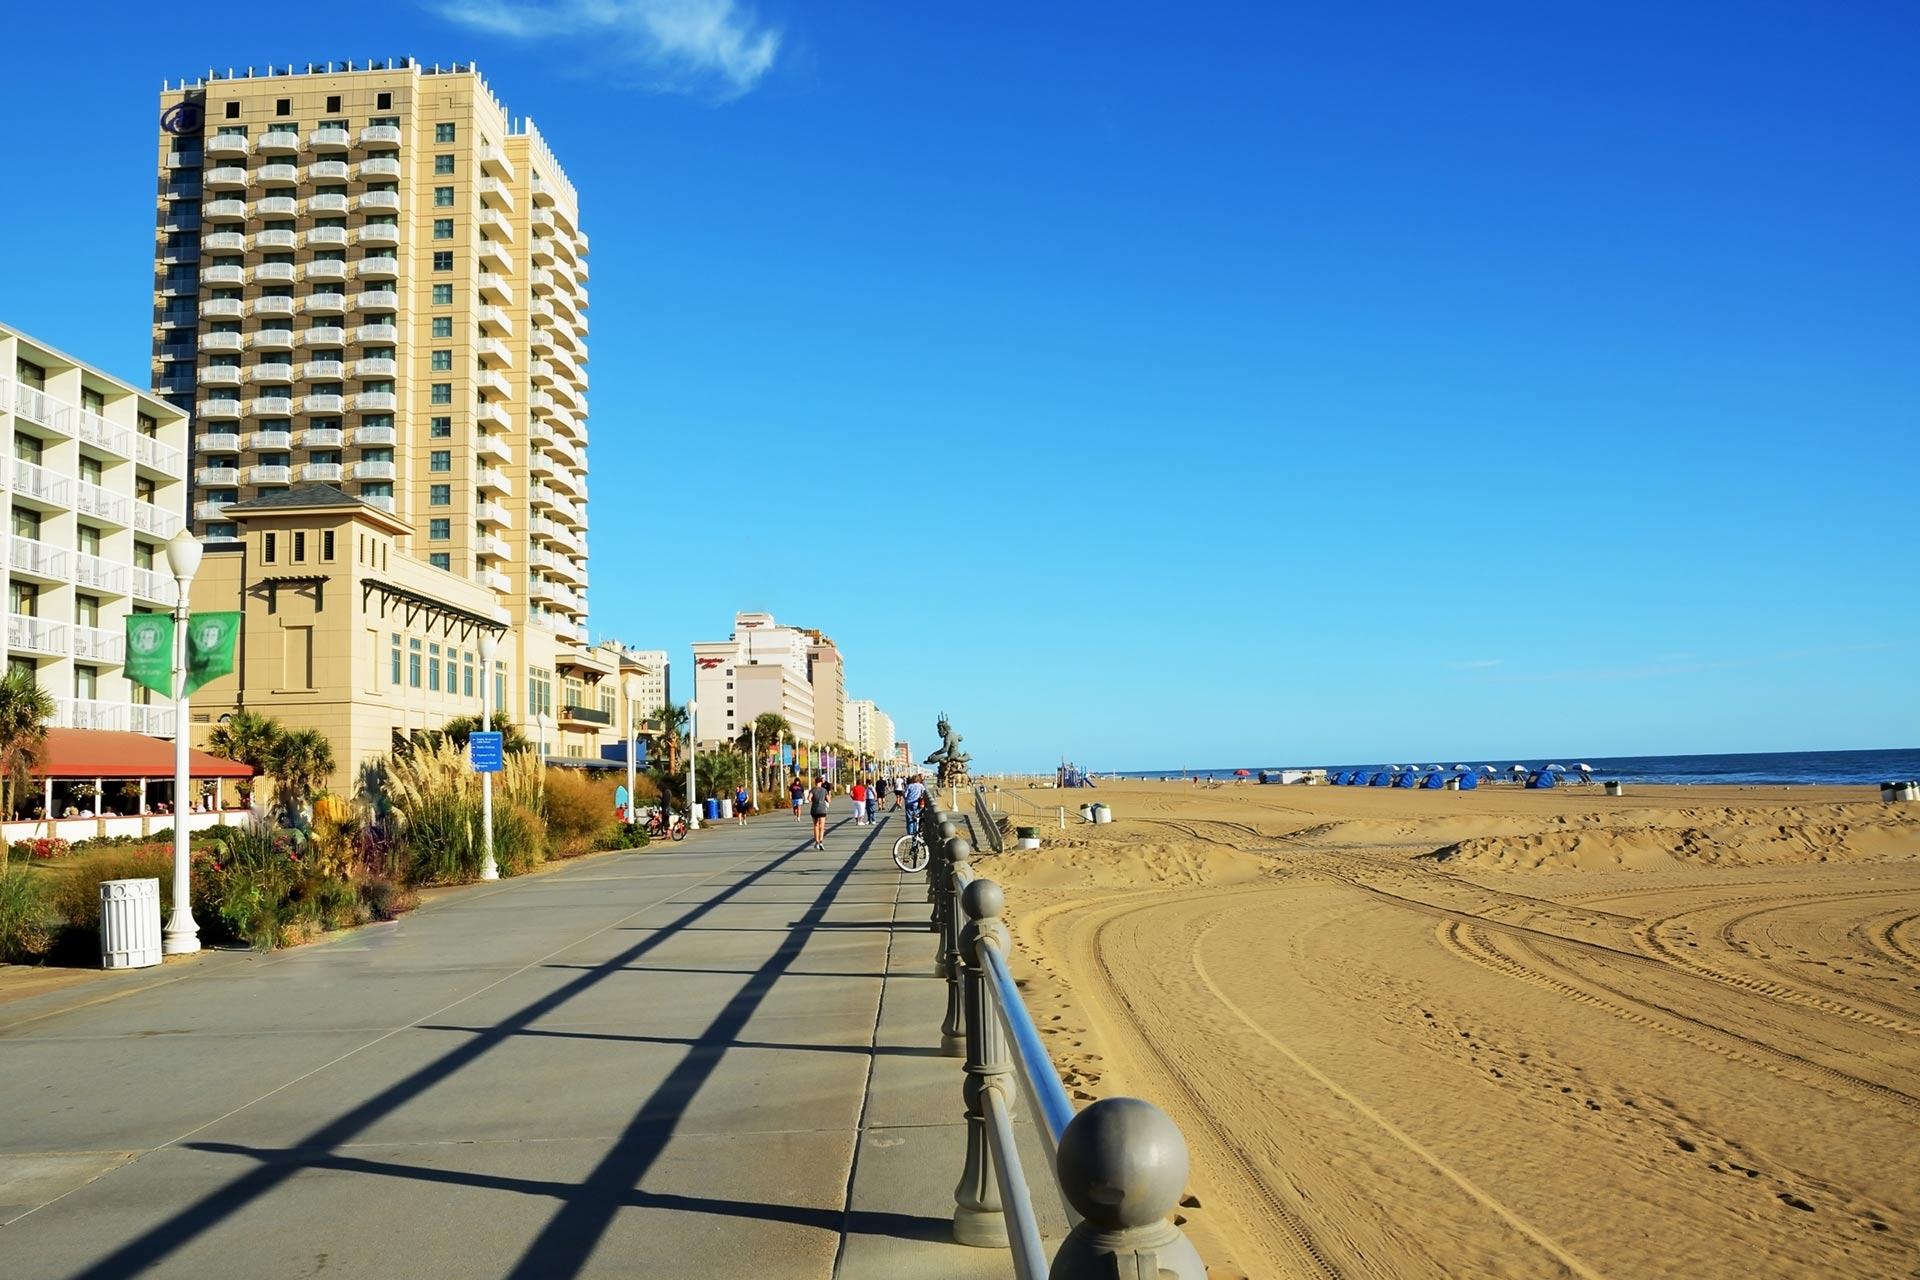 The boardwalk in Virginia Beach.